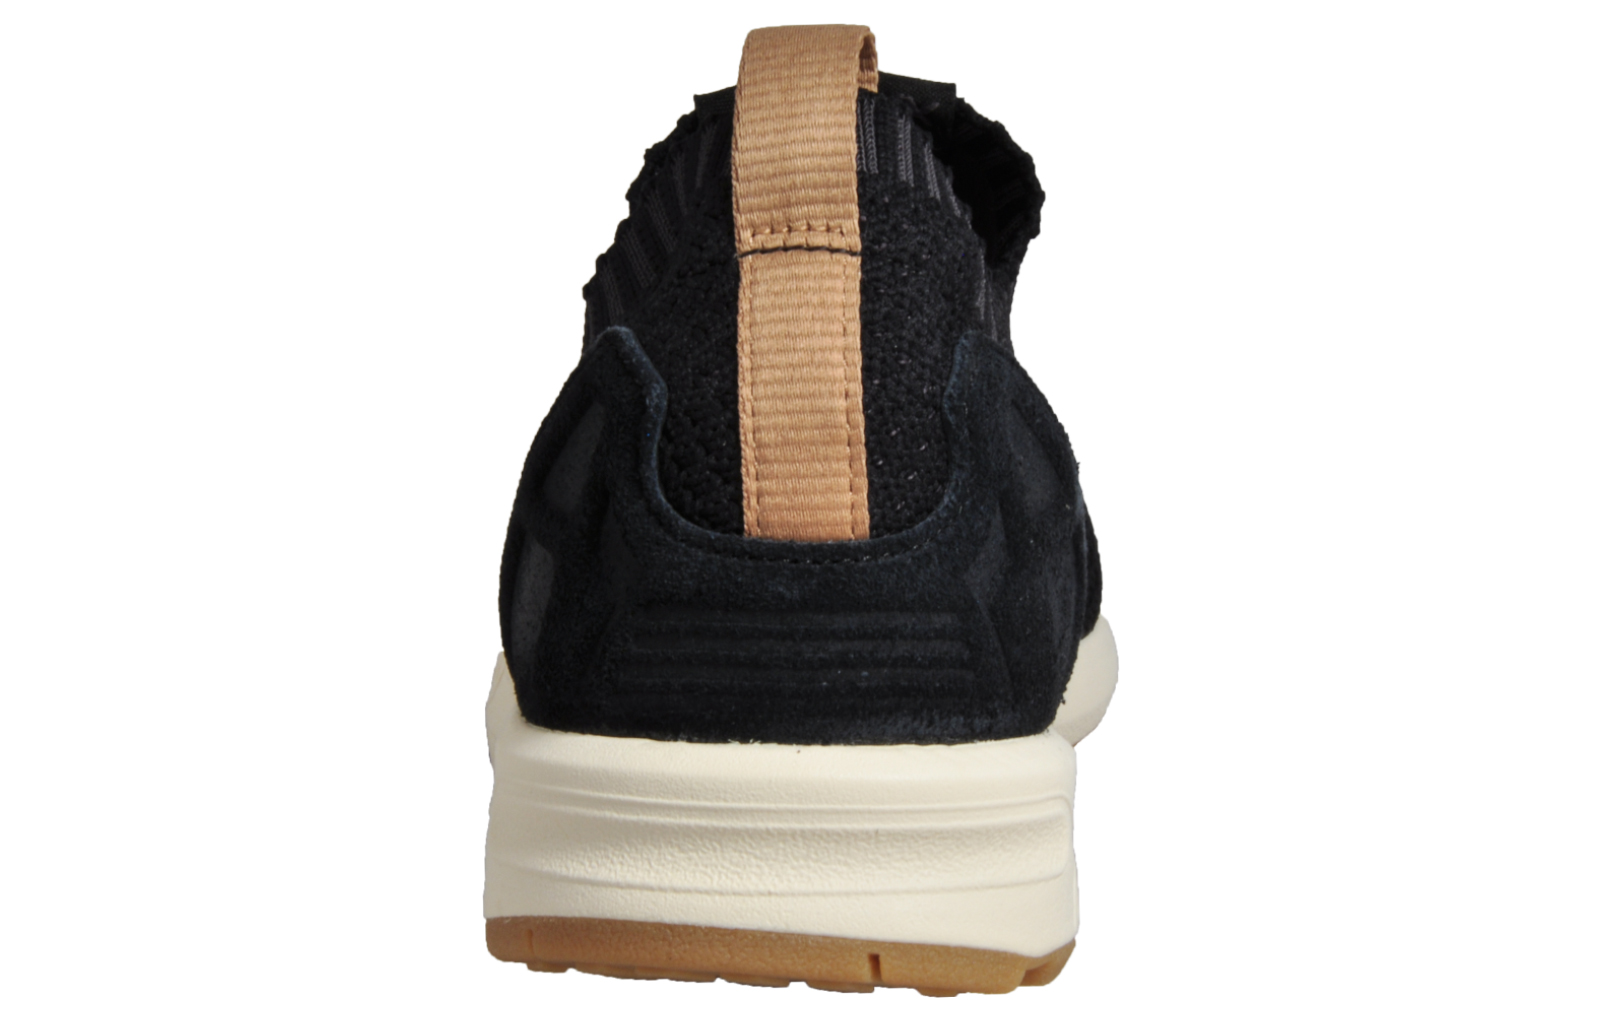 994b73a25 Adidas Originals ZX Flux Primeknit Men s Casual Gym Trainers Black ...